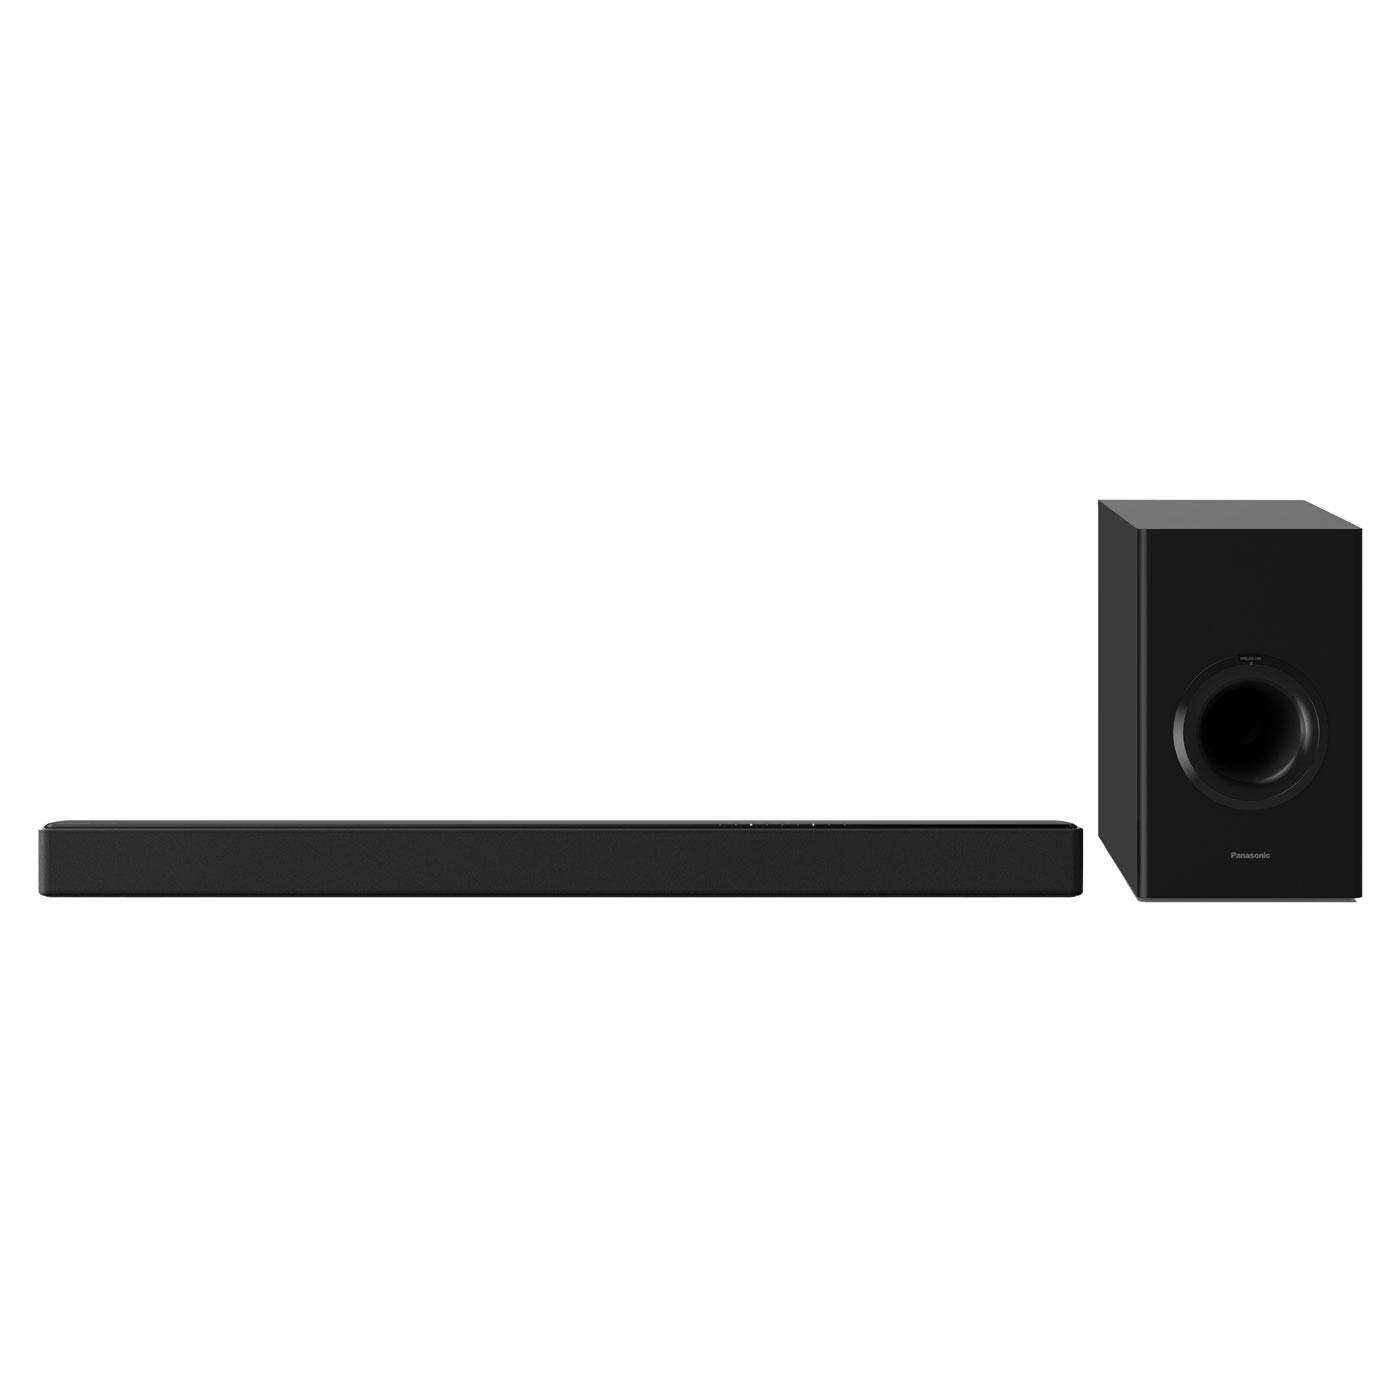 panasonic sc htb488 barre de son panasonic sur. Black Bedroom Furniture Sets. Home Design Ideas